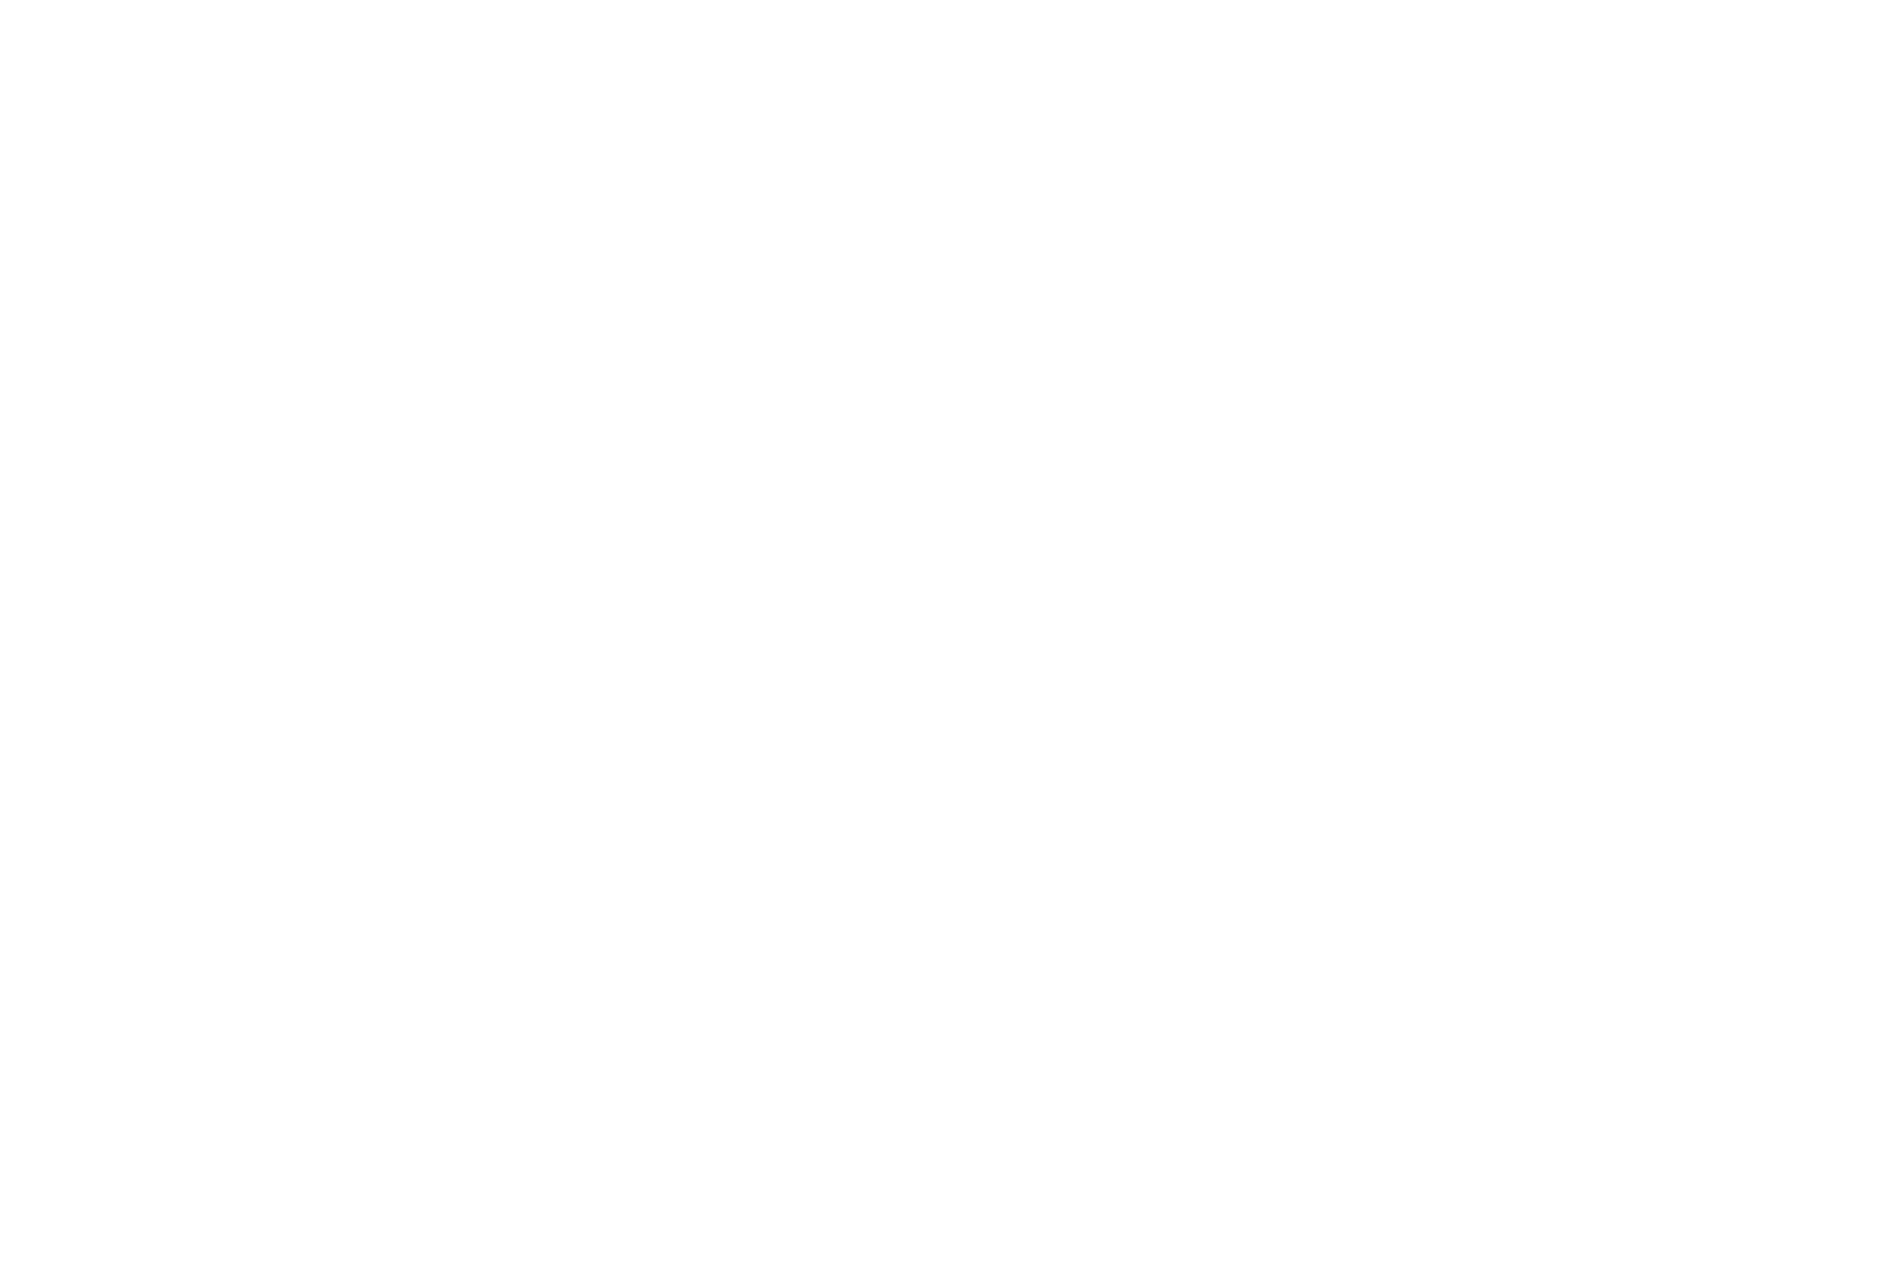 novo_logo_OFTA_branco